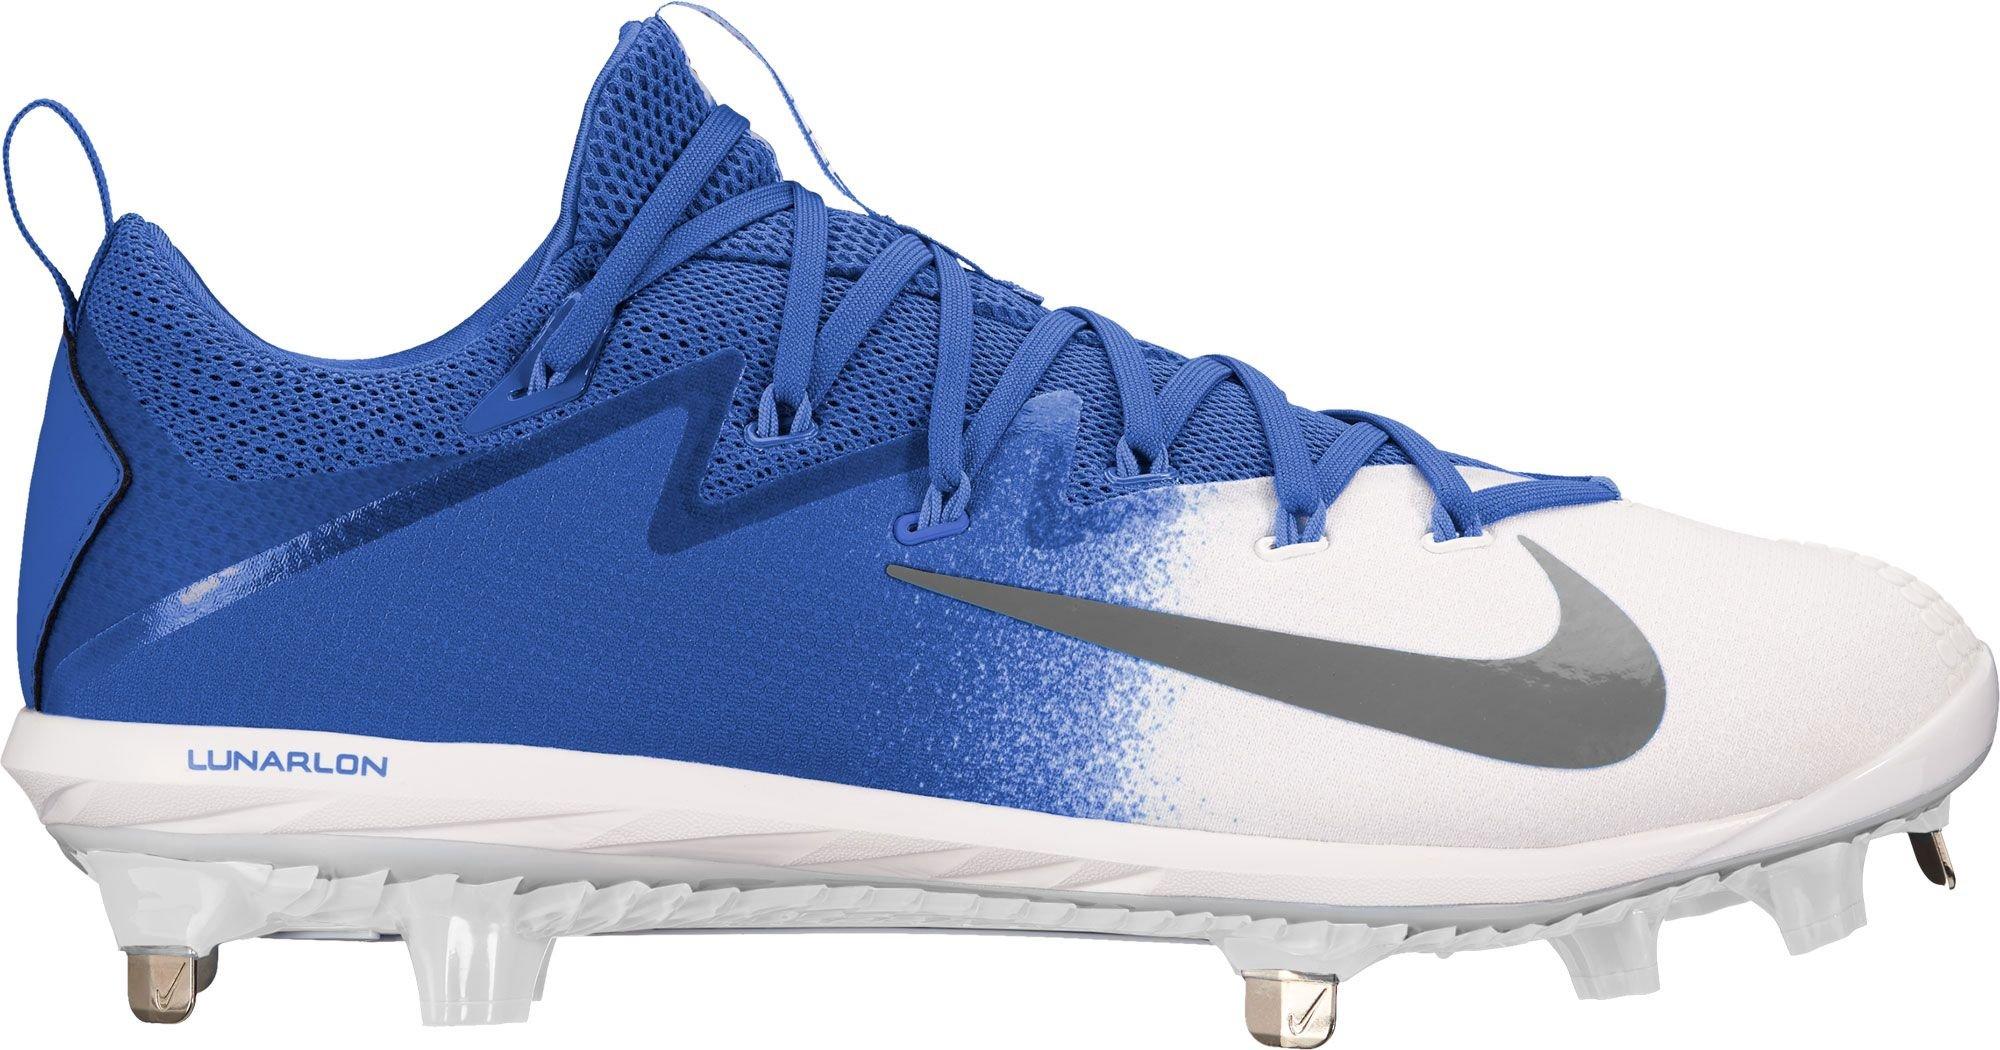 7fd6dc1e168 Galleon - Nike Men s Lunar Vapor Ultrafly Pro Metal Baseball Cleats Shoe